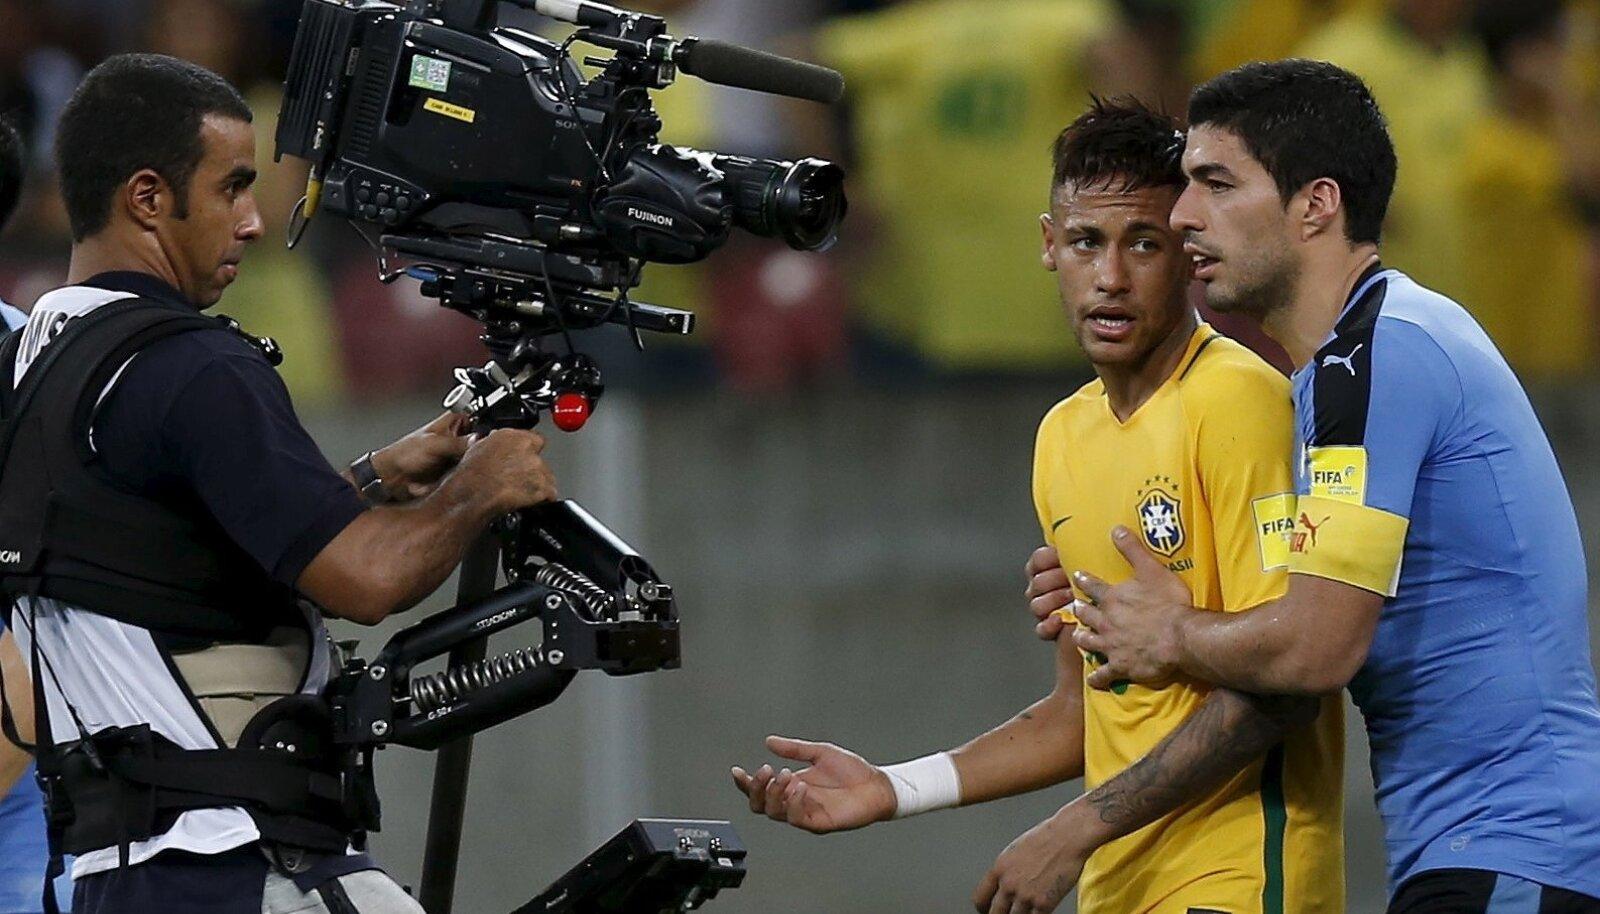 Football Soccer - Brazil v Uruguay - World Cup Qualifiers